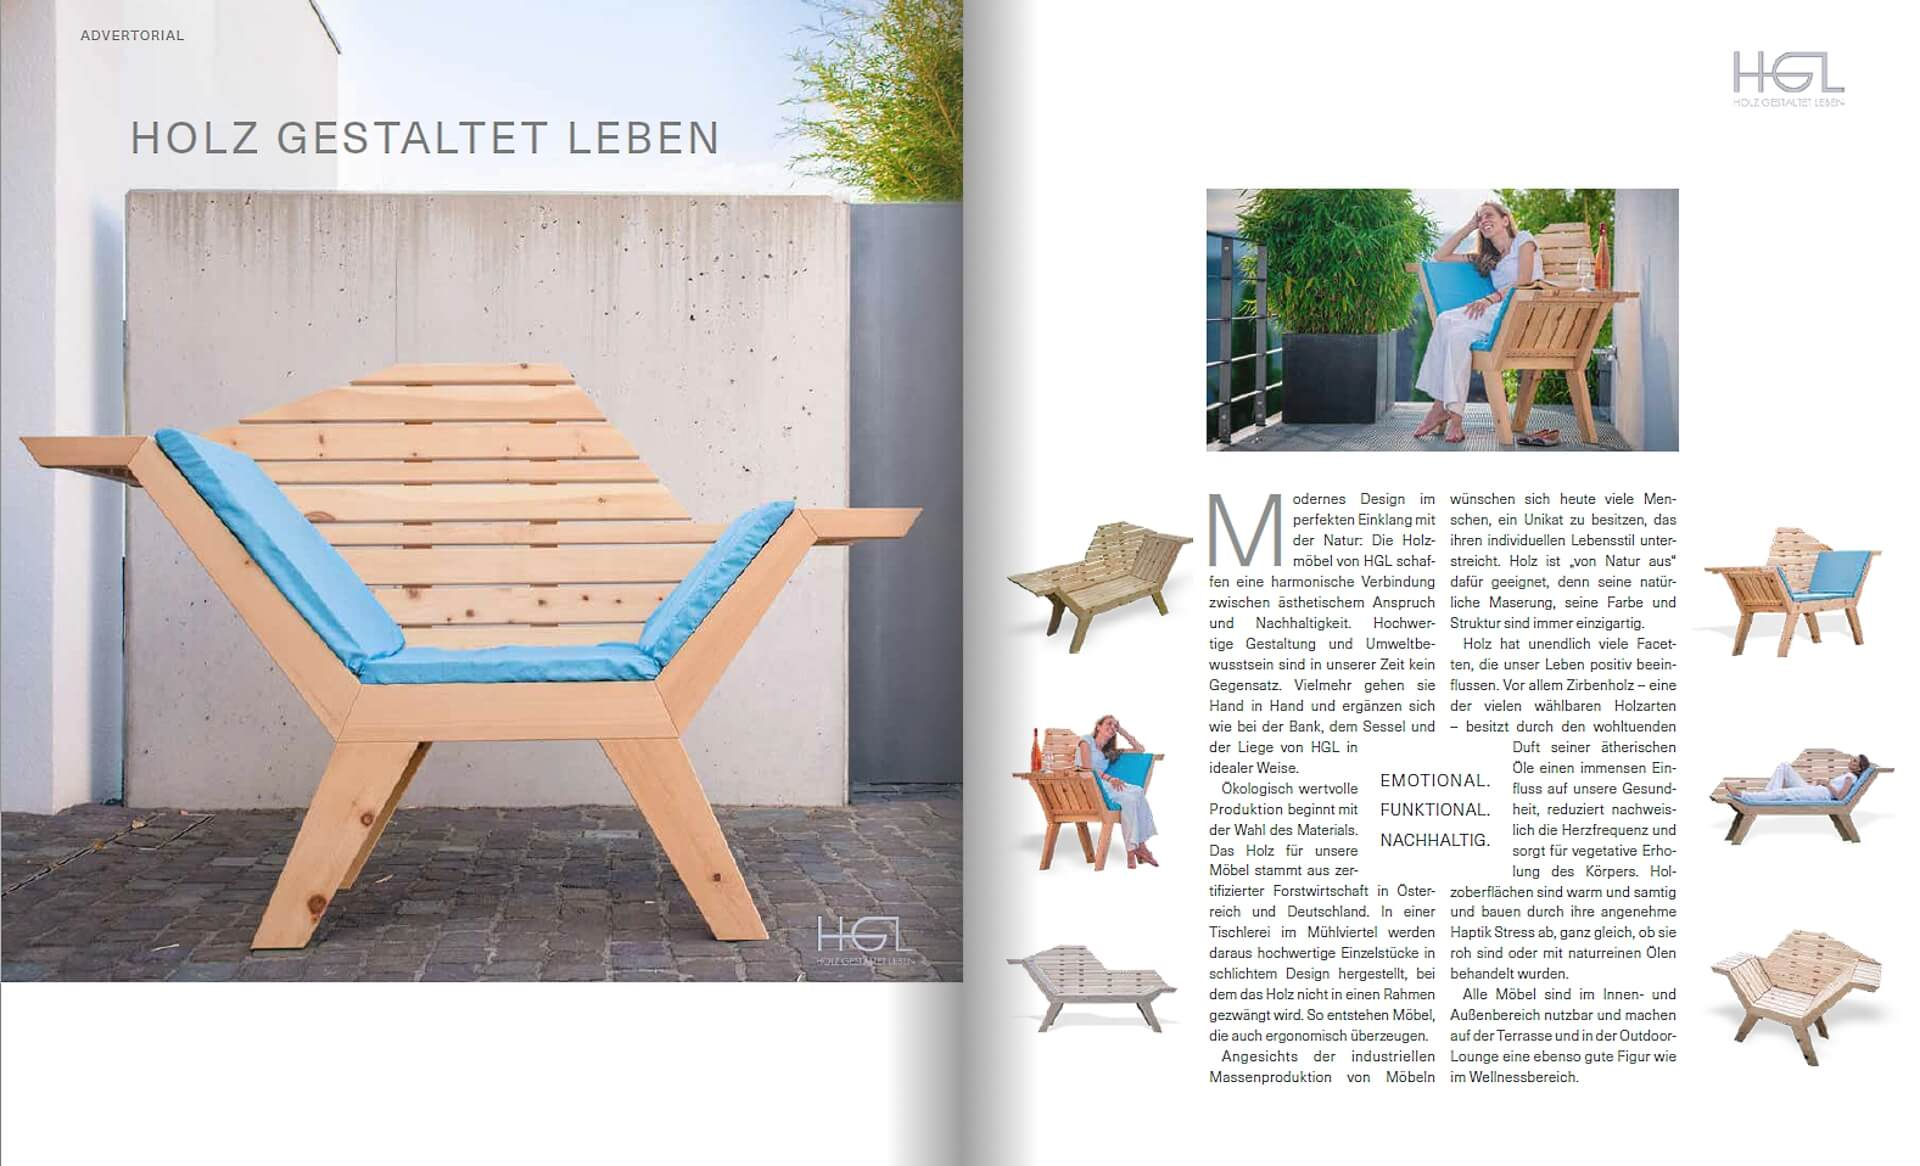 GARTENDESIGN INSPIRATION Ausgabe 3/2018: Holz Gestaltet Leben